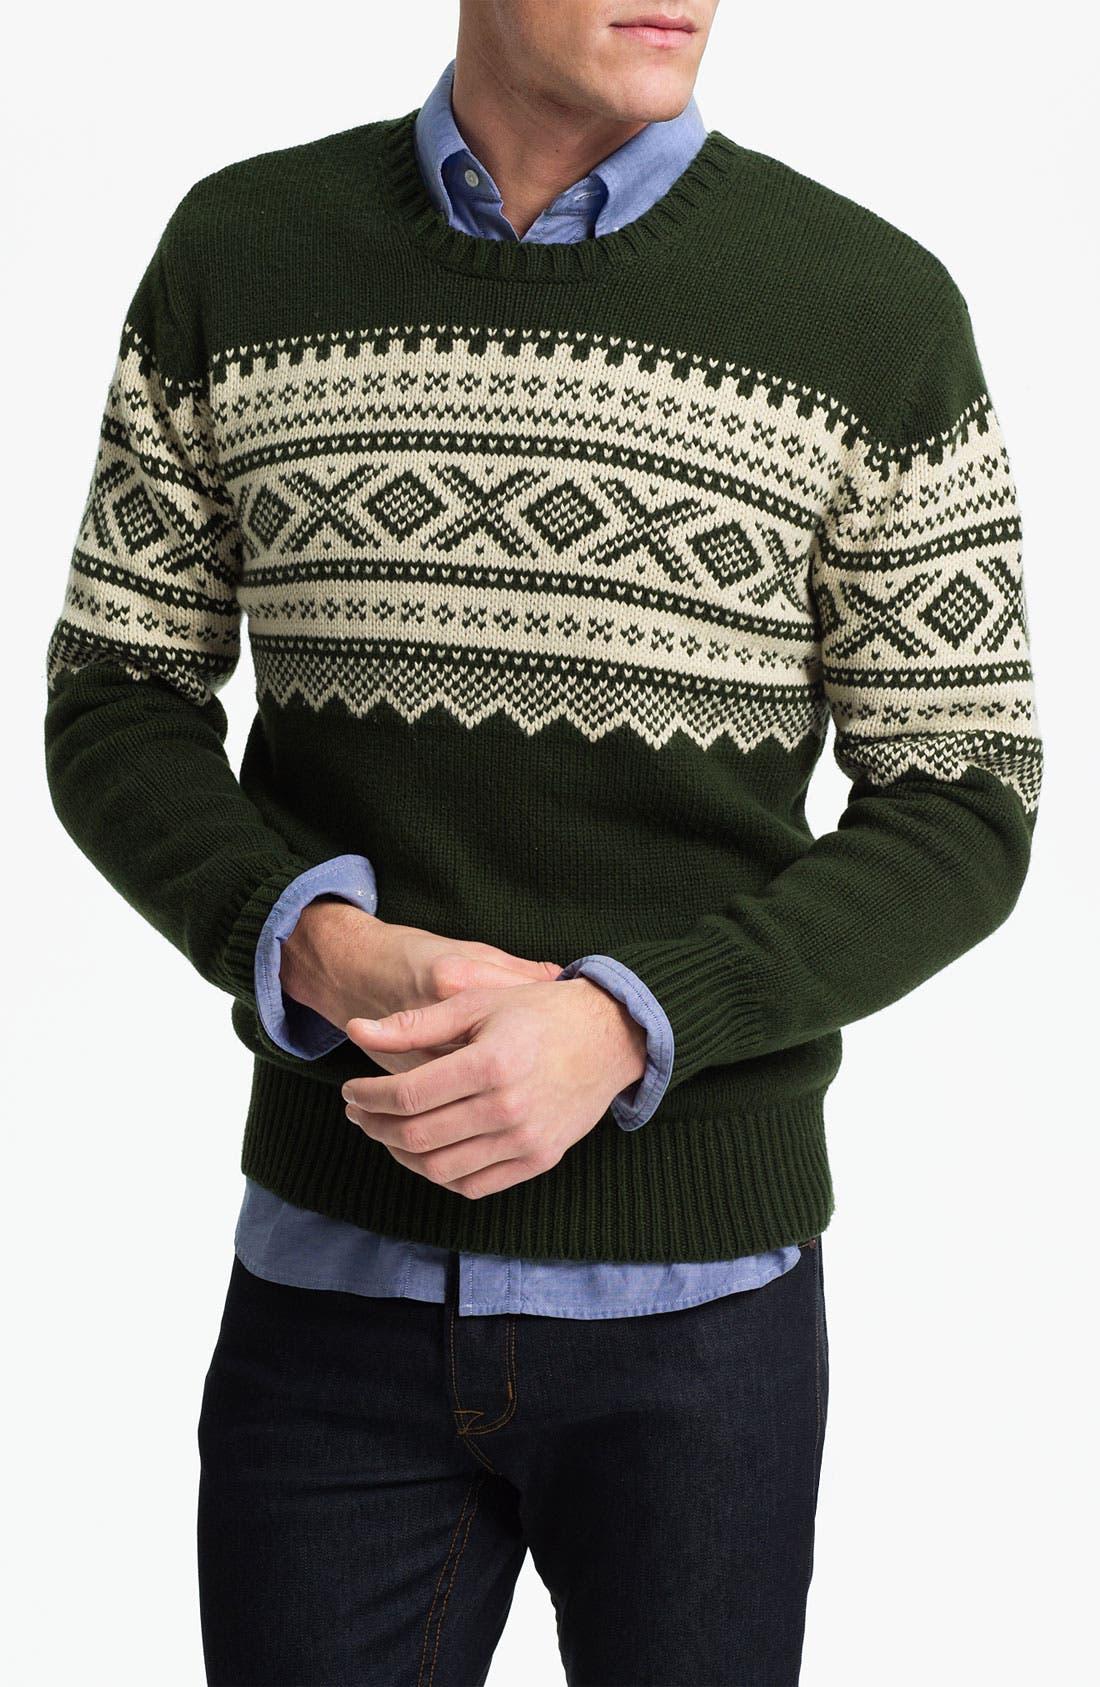 Alternate Image 1 Selected - Gant Rugger Jacquard Crewneck Sweater